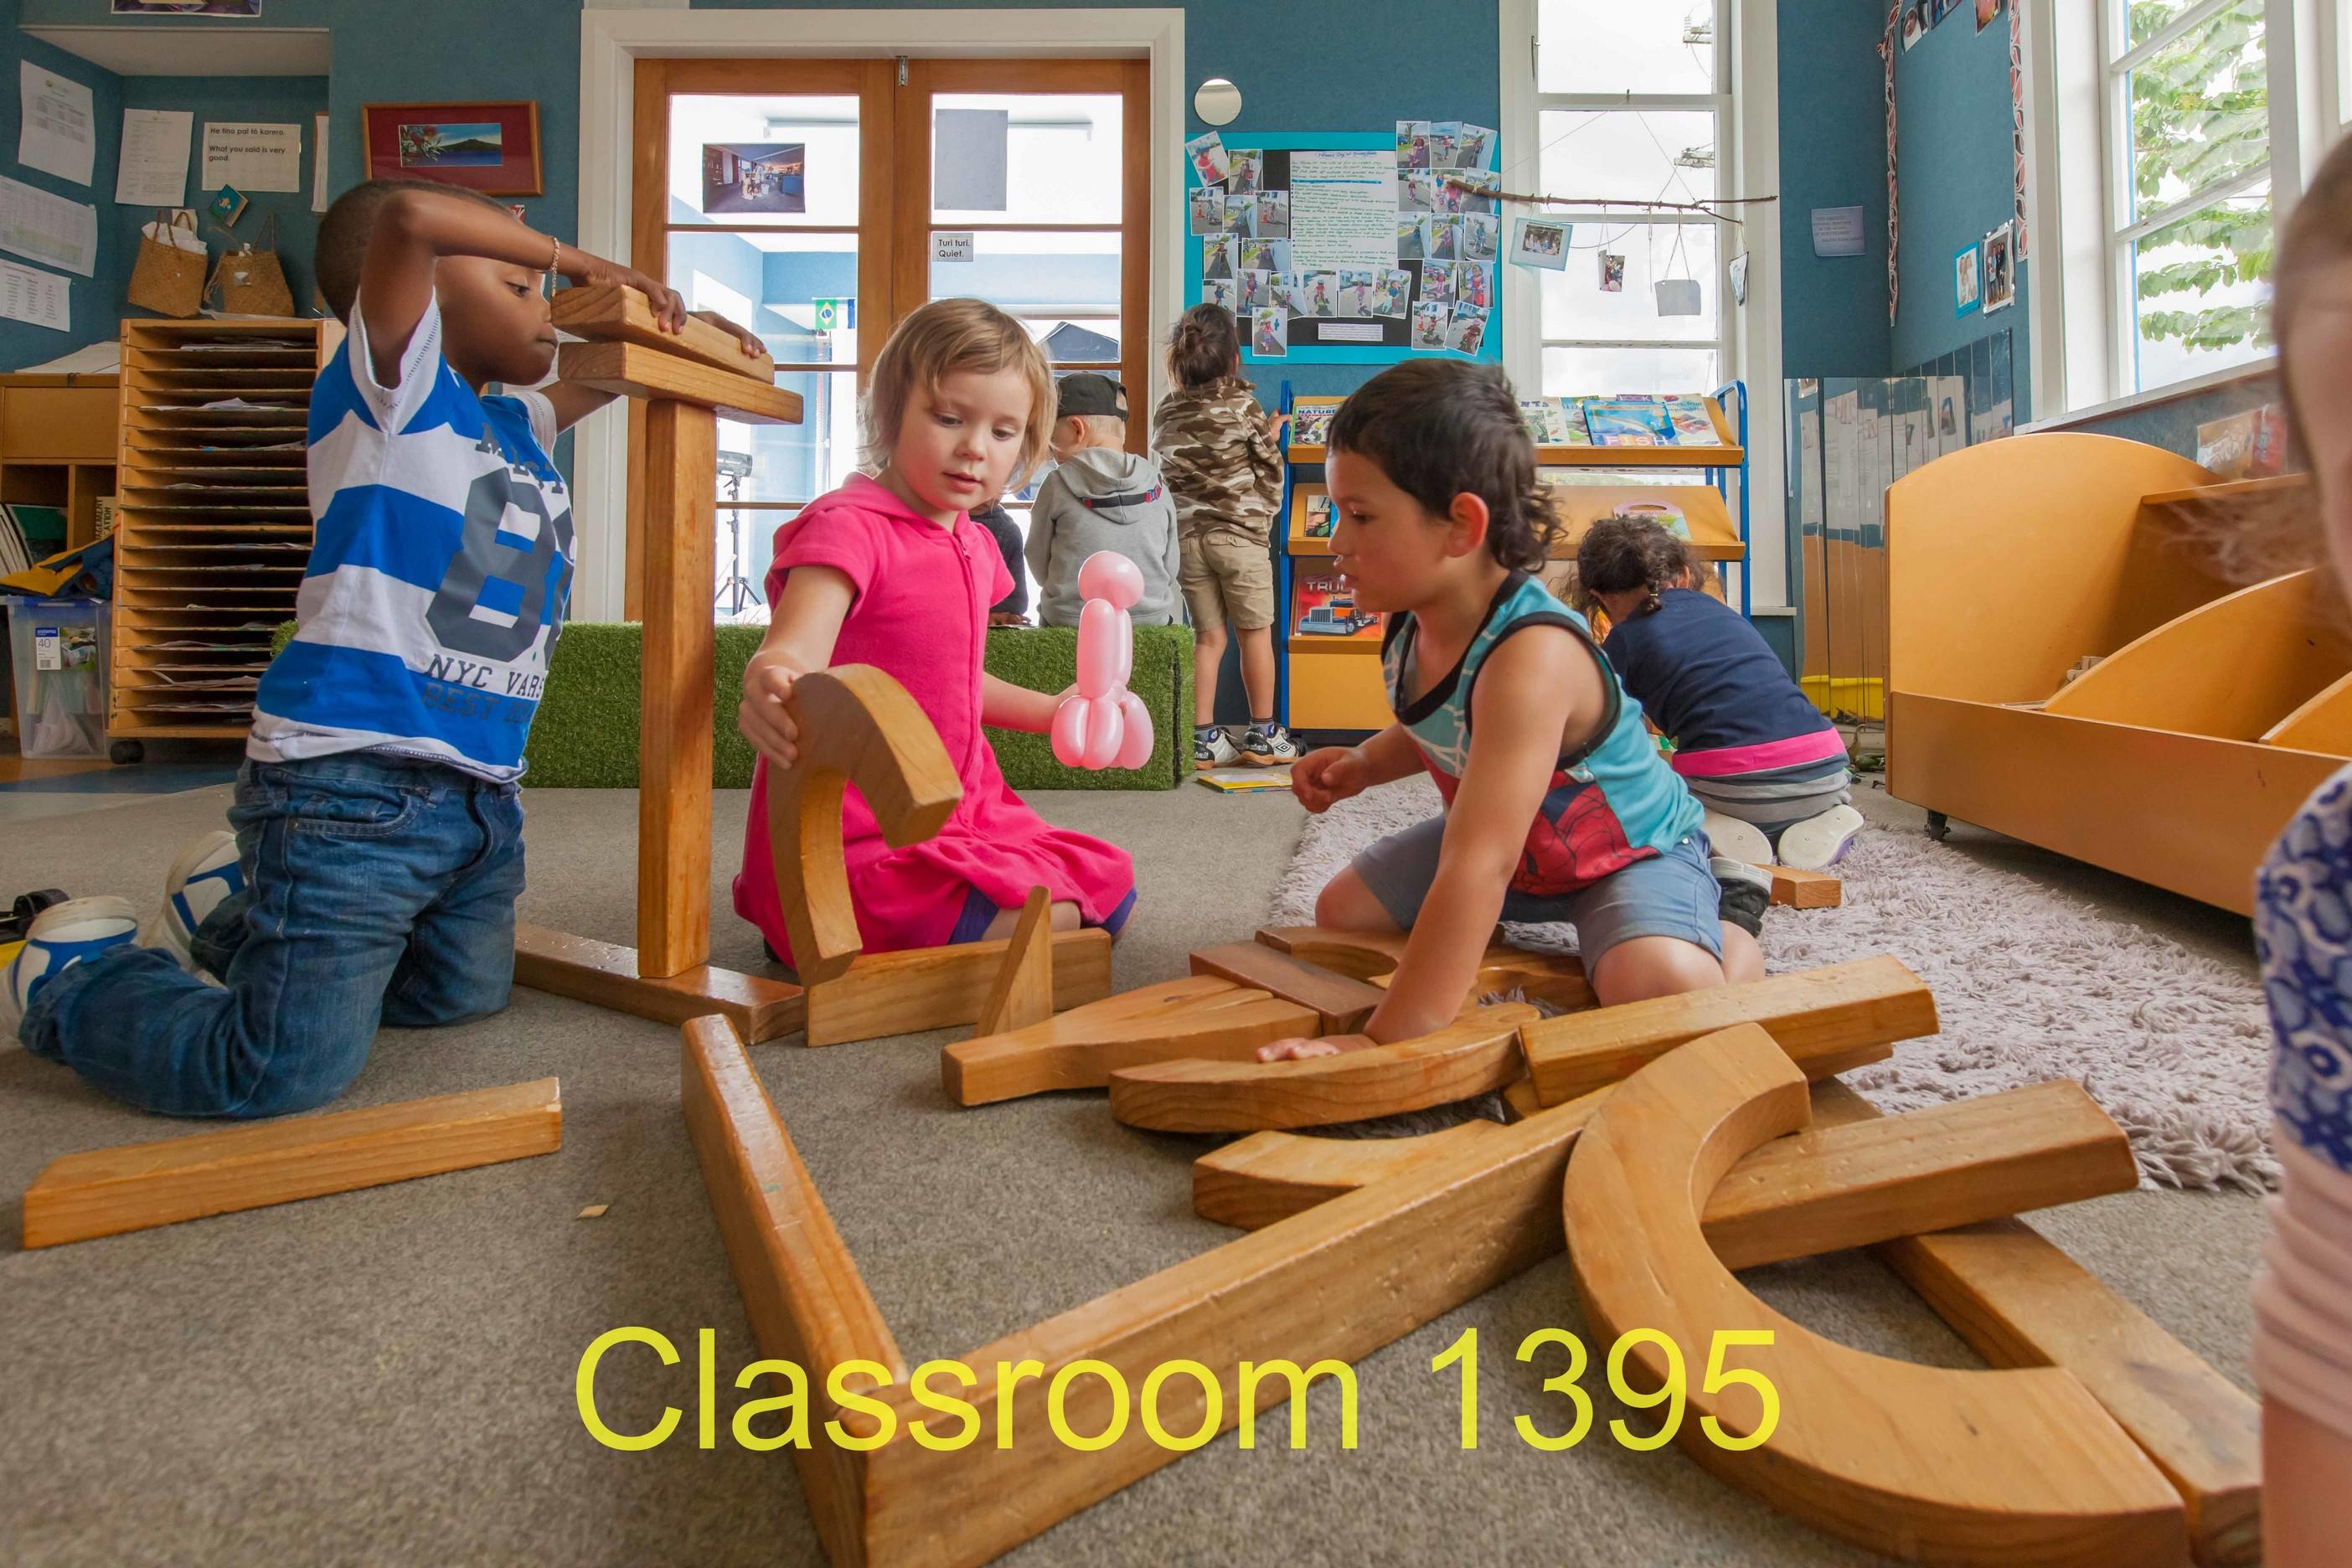 Classroom 1395